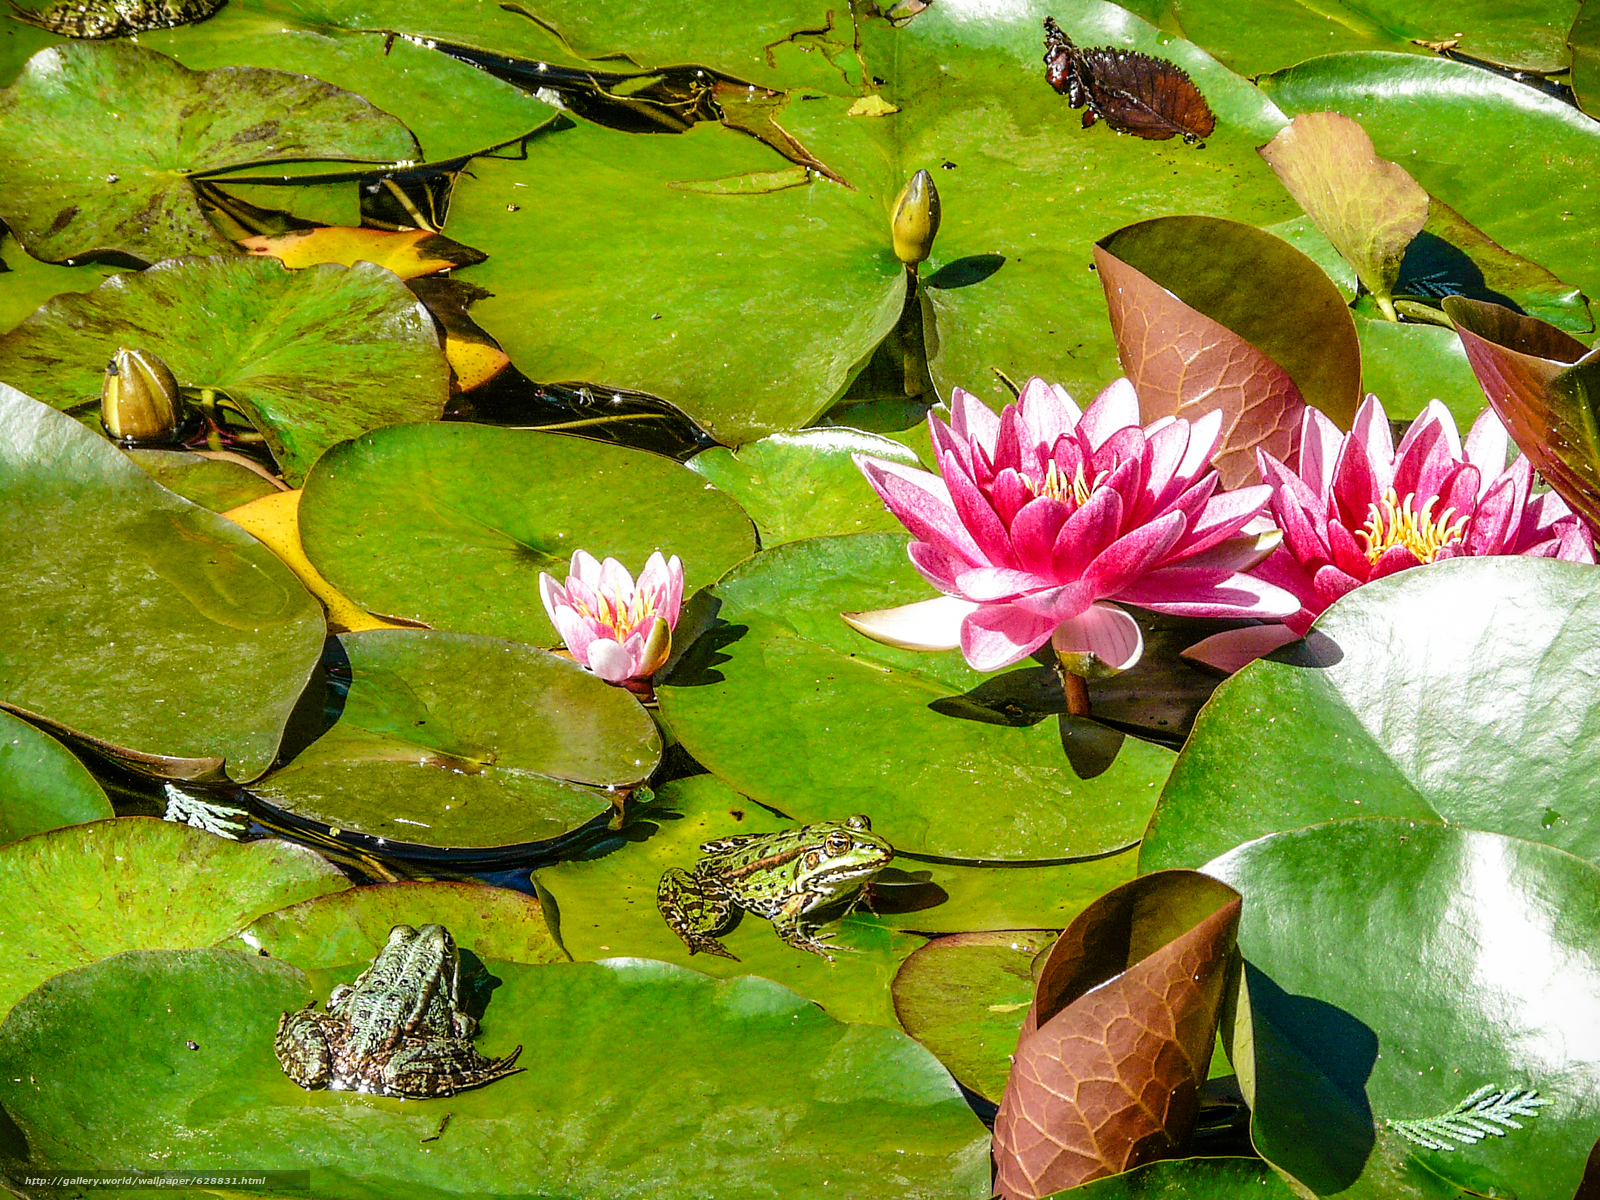 водяные лилии, водоём, лягушки, природа